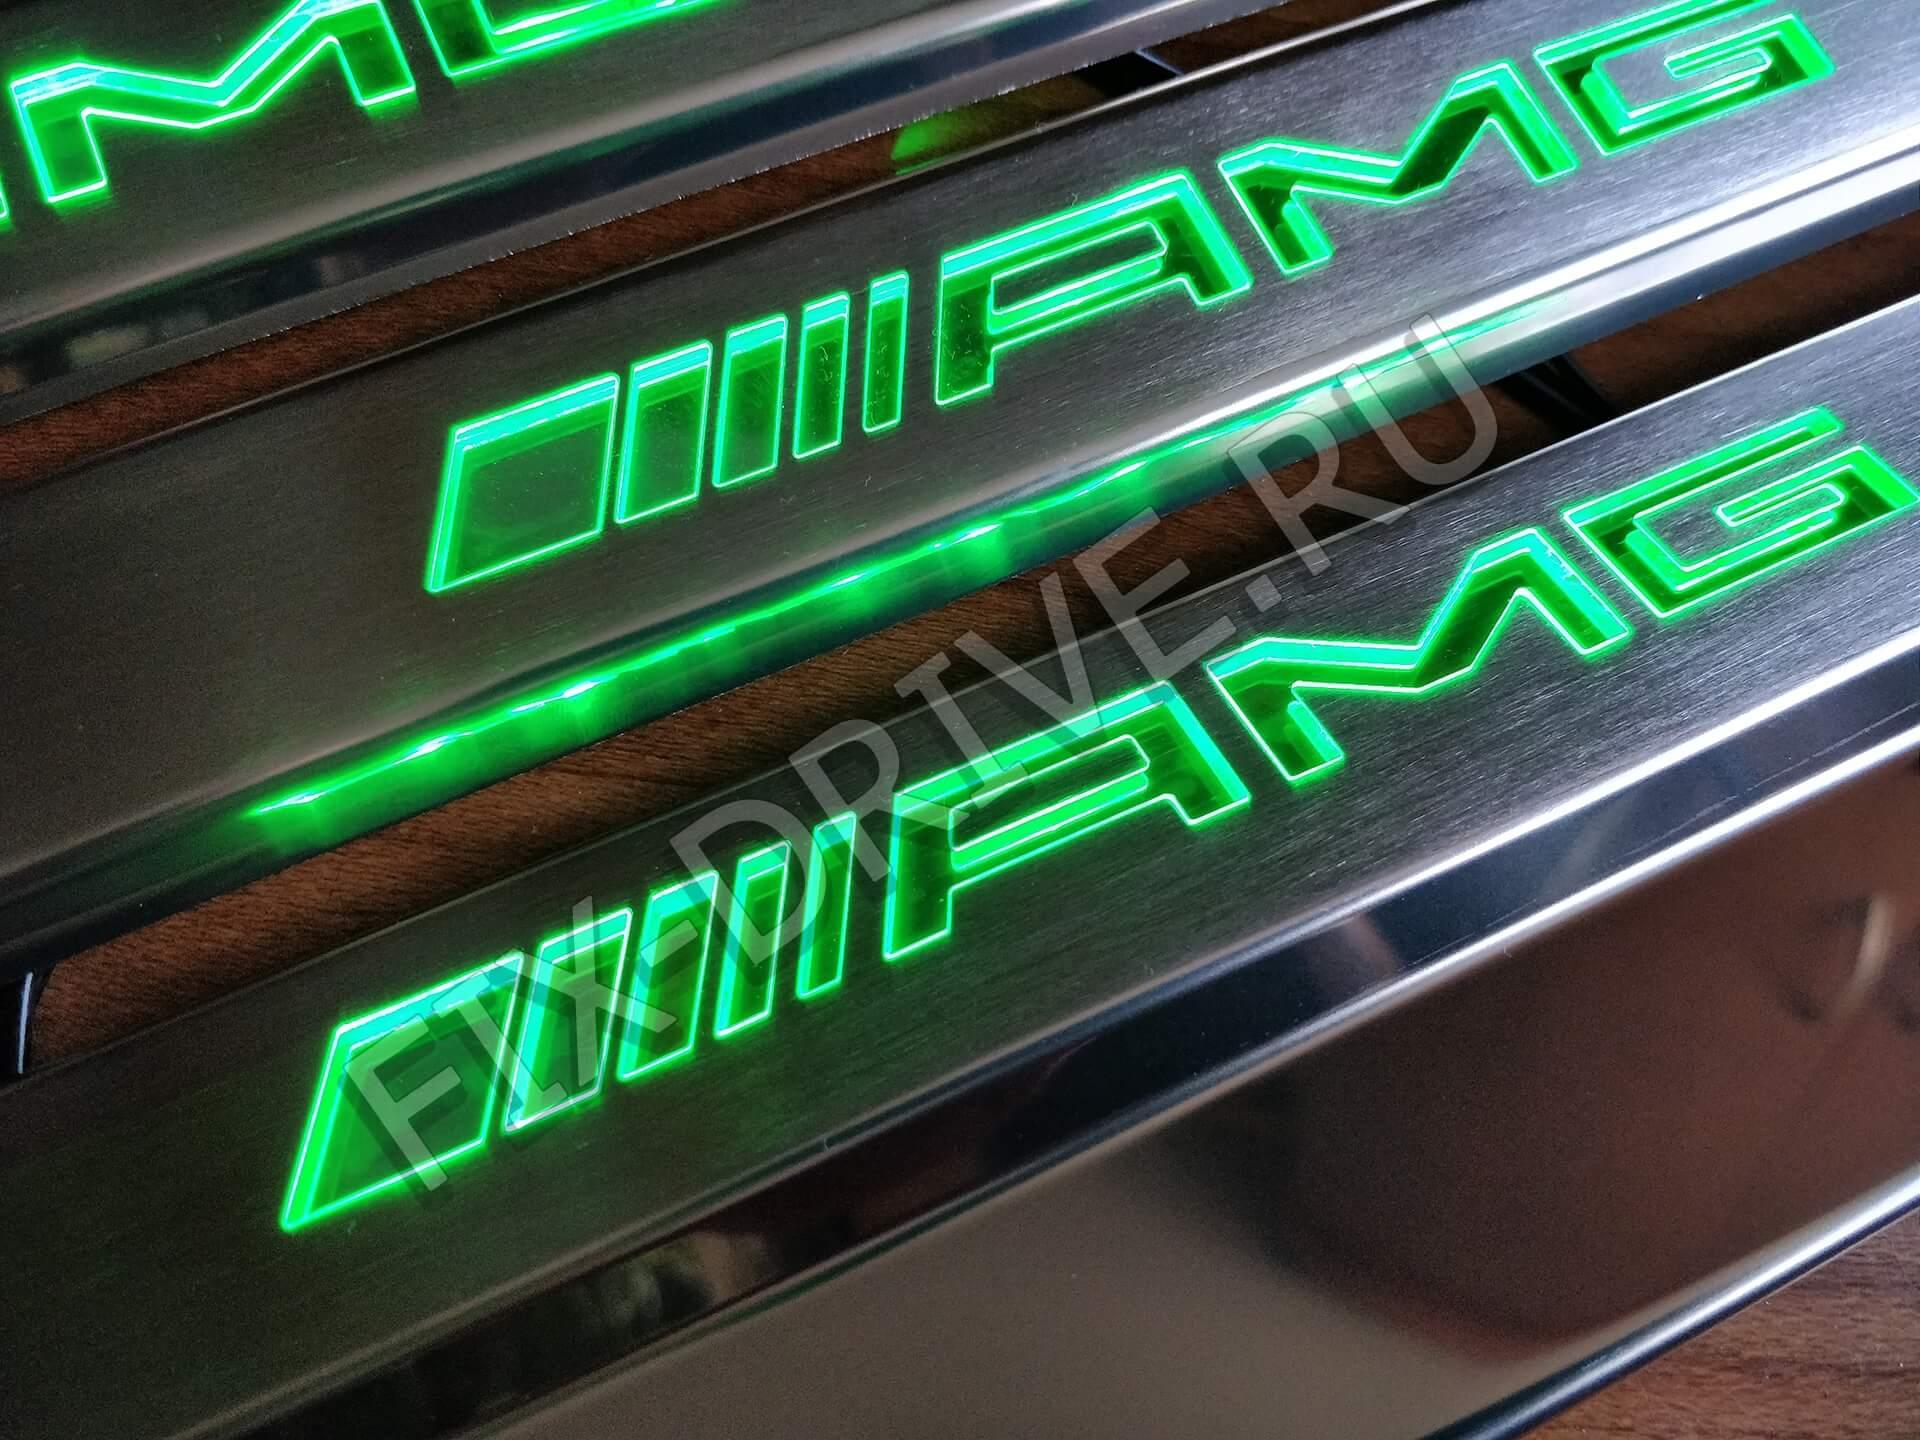 Накладки на подножки AMG w463 G63 G65 зеленыая